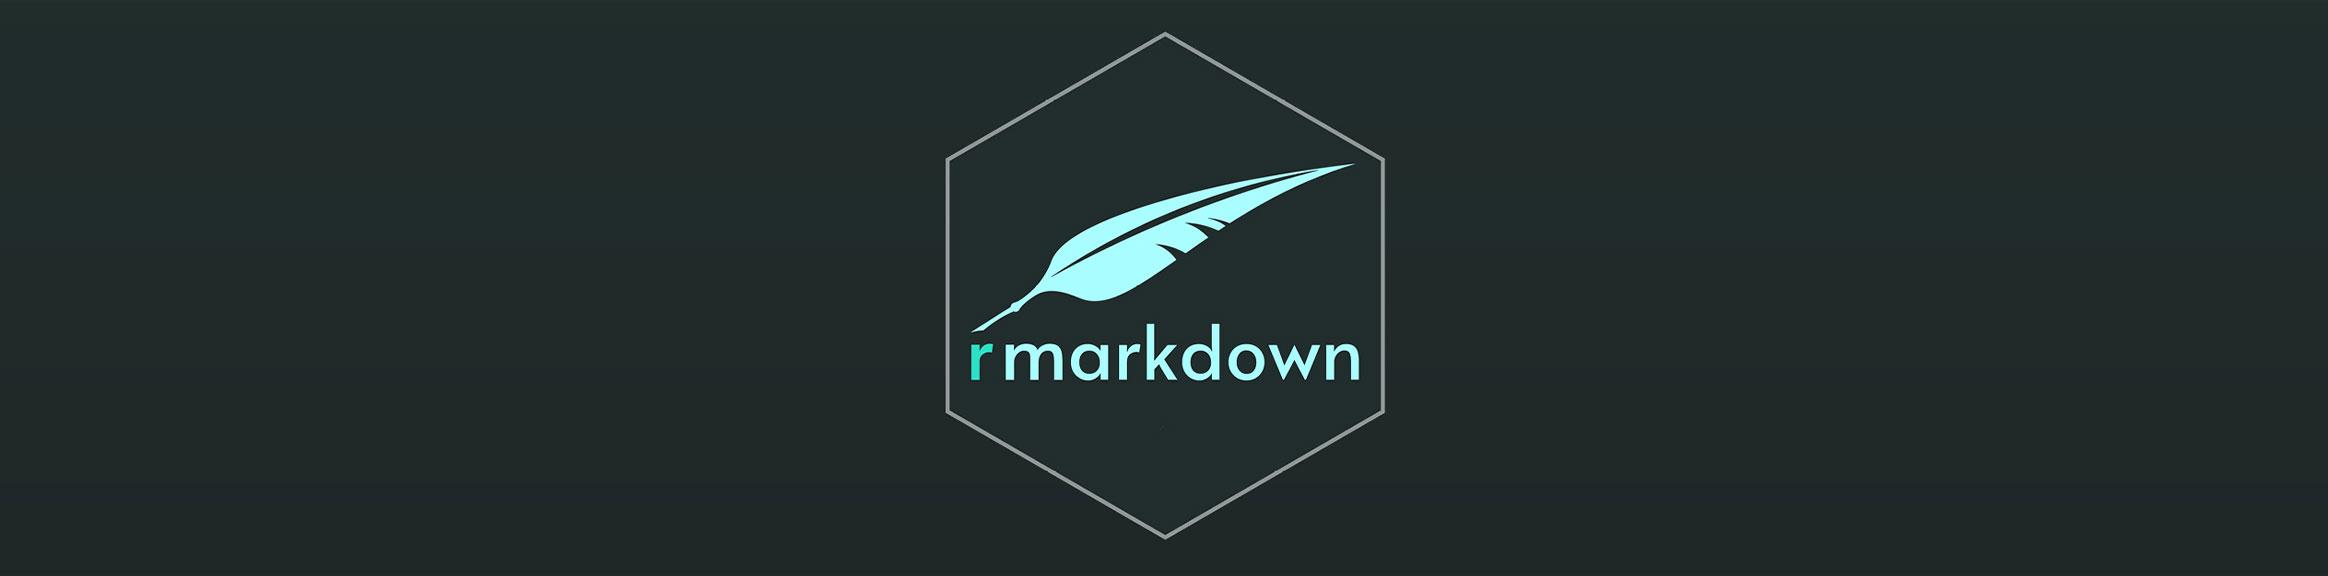 R Markdown Logo